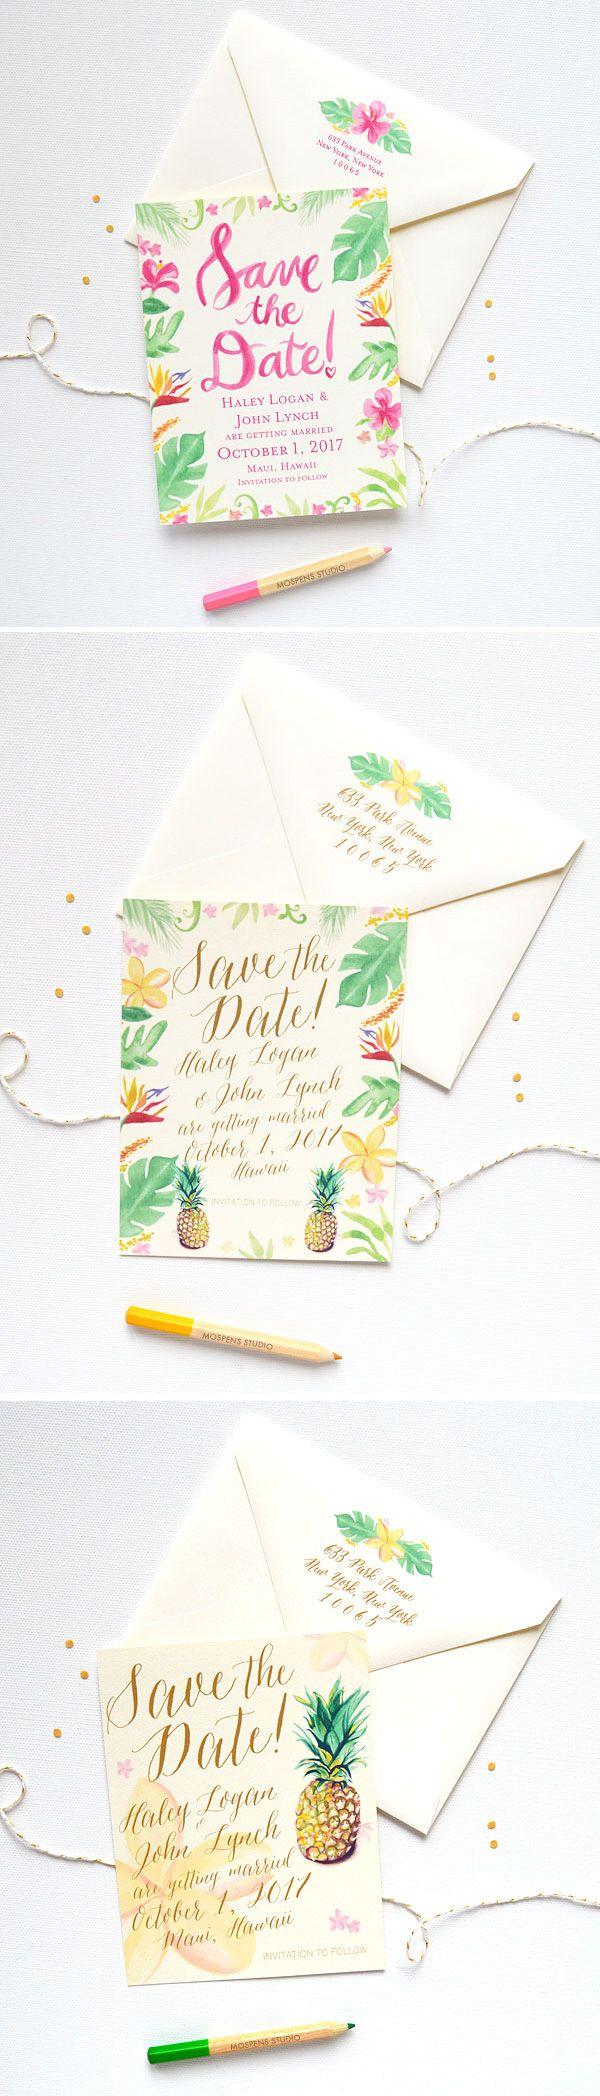 Mospens Studio Wedding Cards